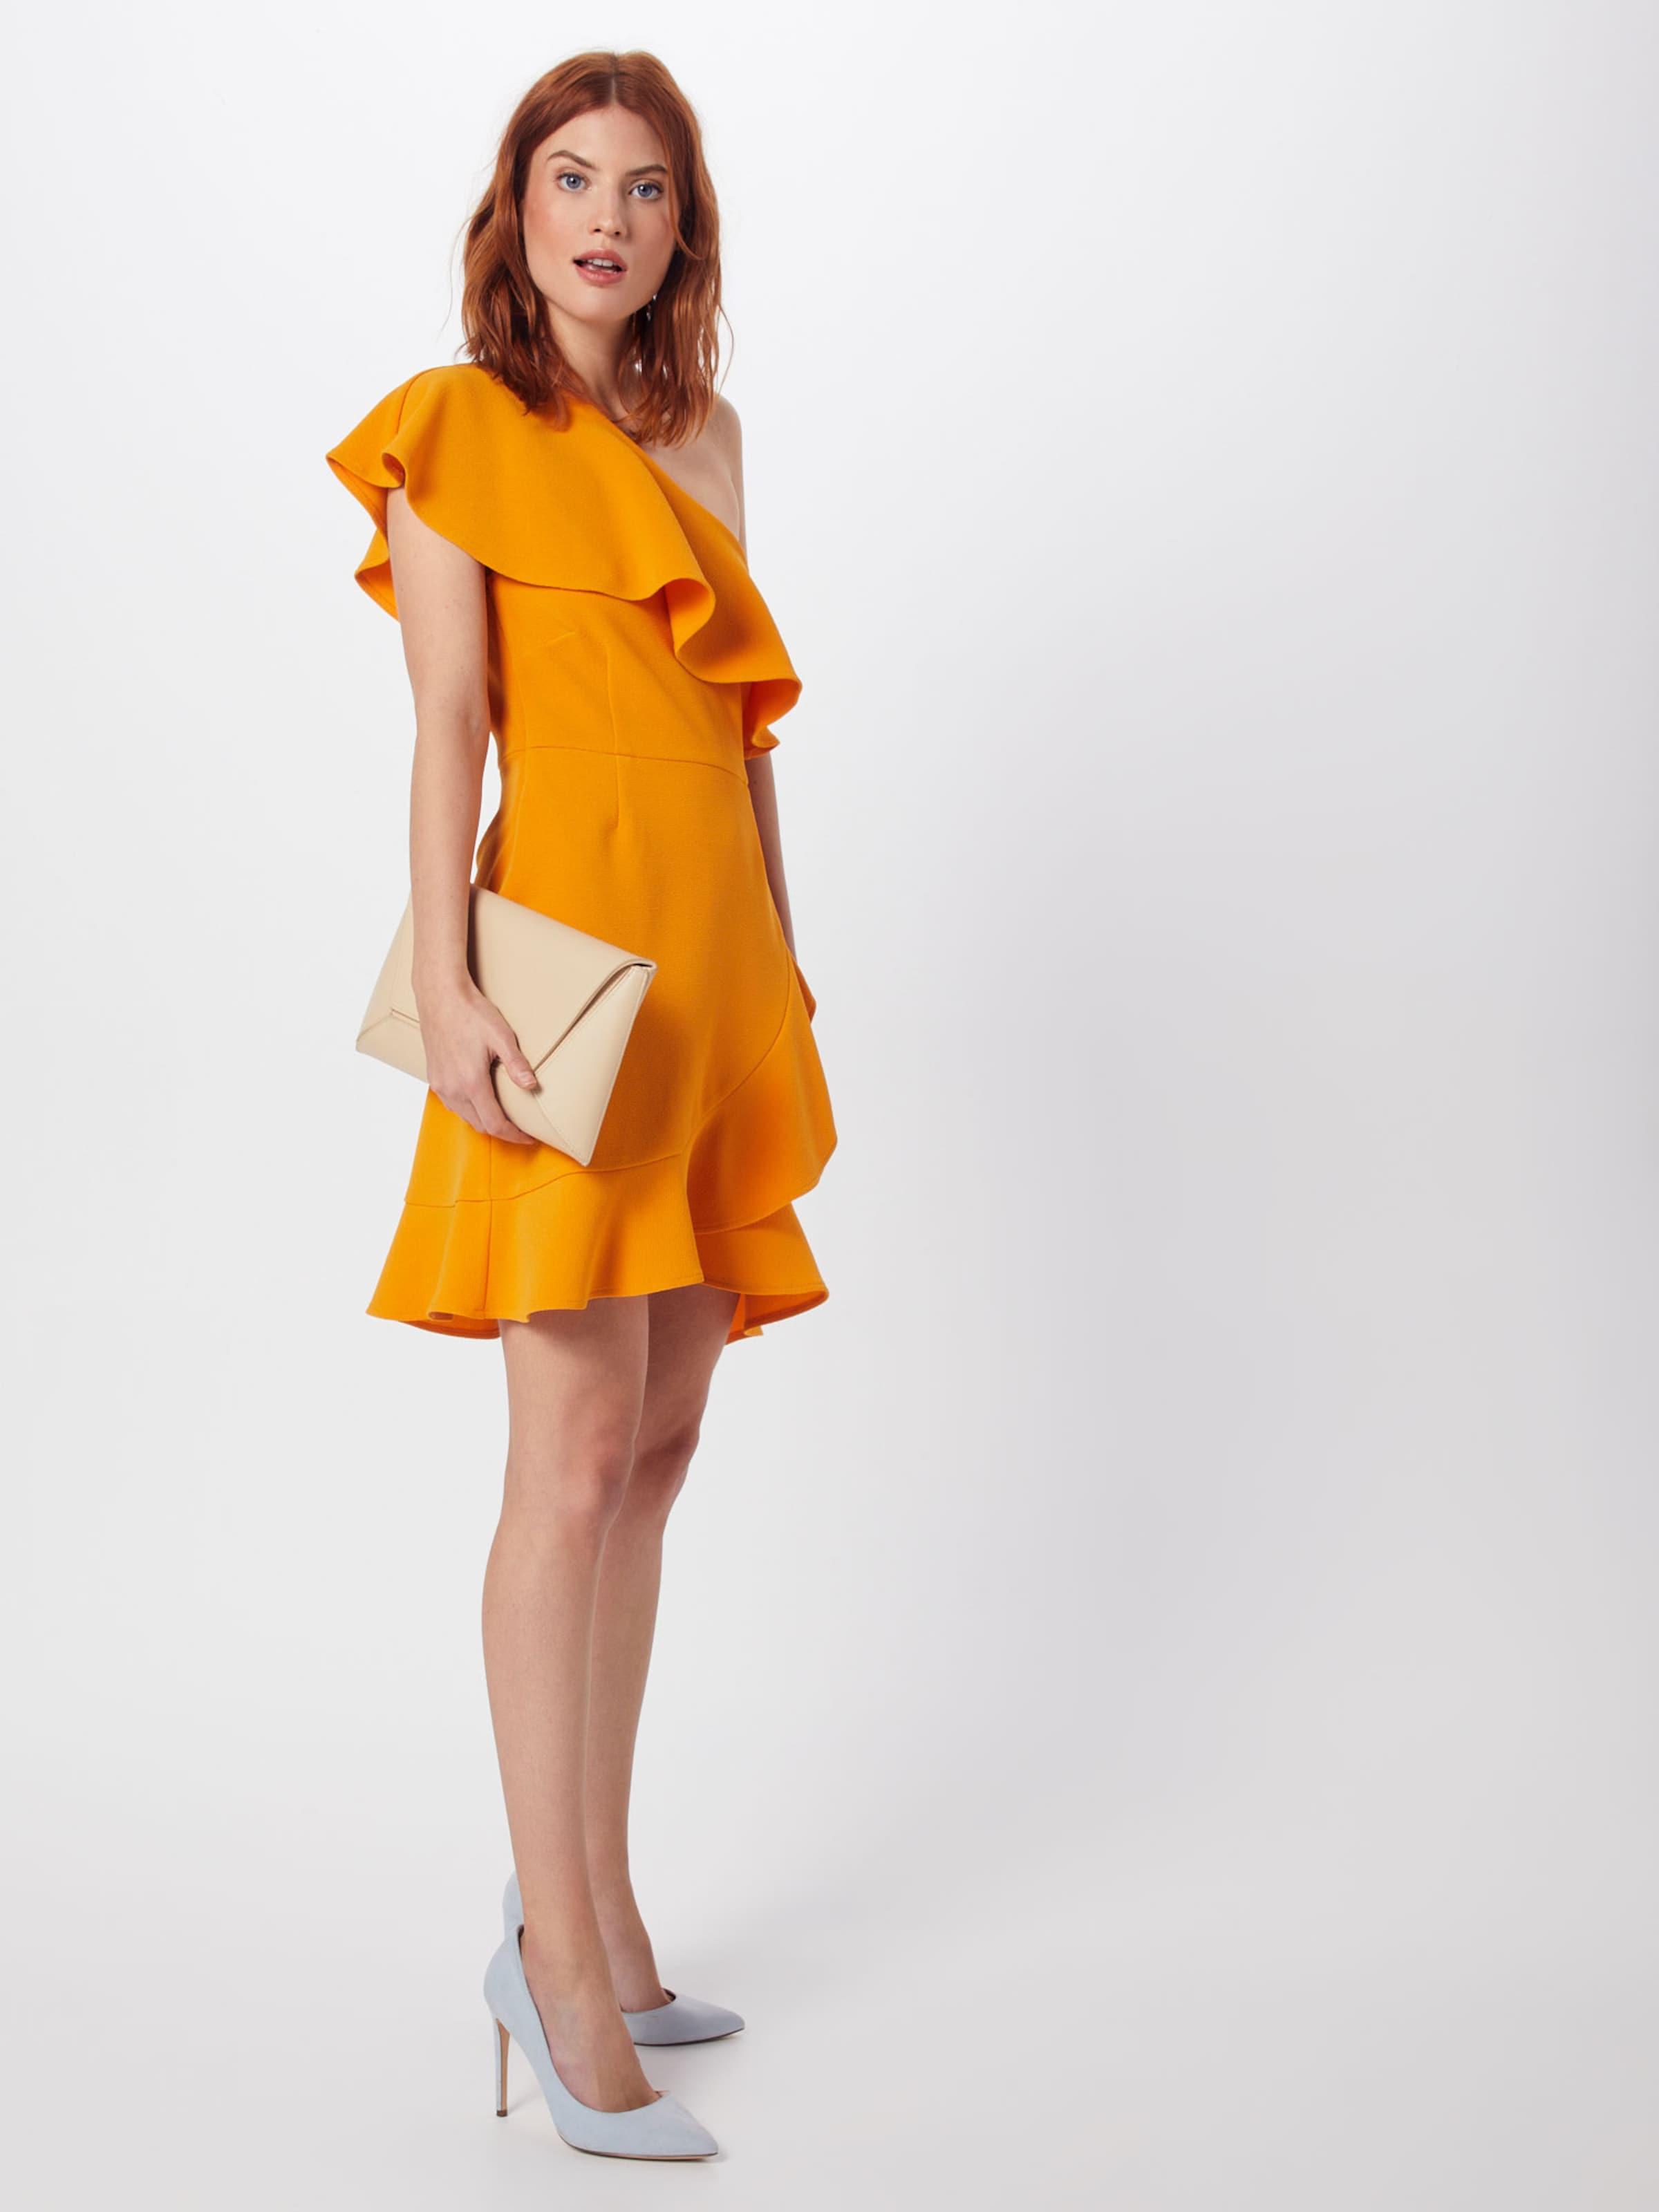 Ponte' Minkpink D'été En 'tangerine Robe Orange tshCdQrx